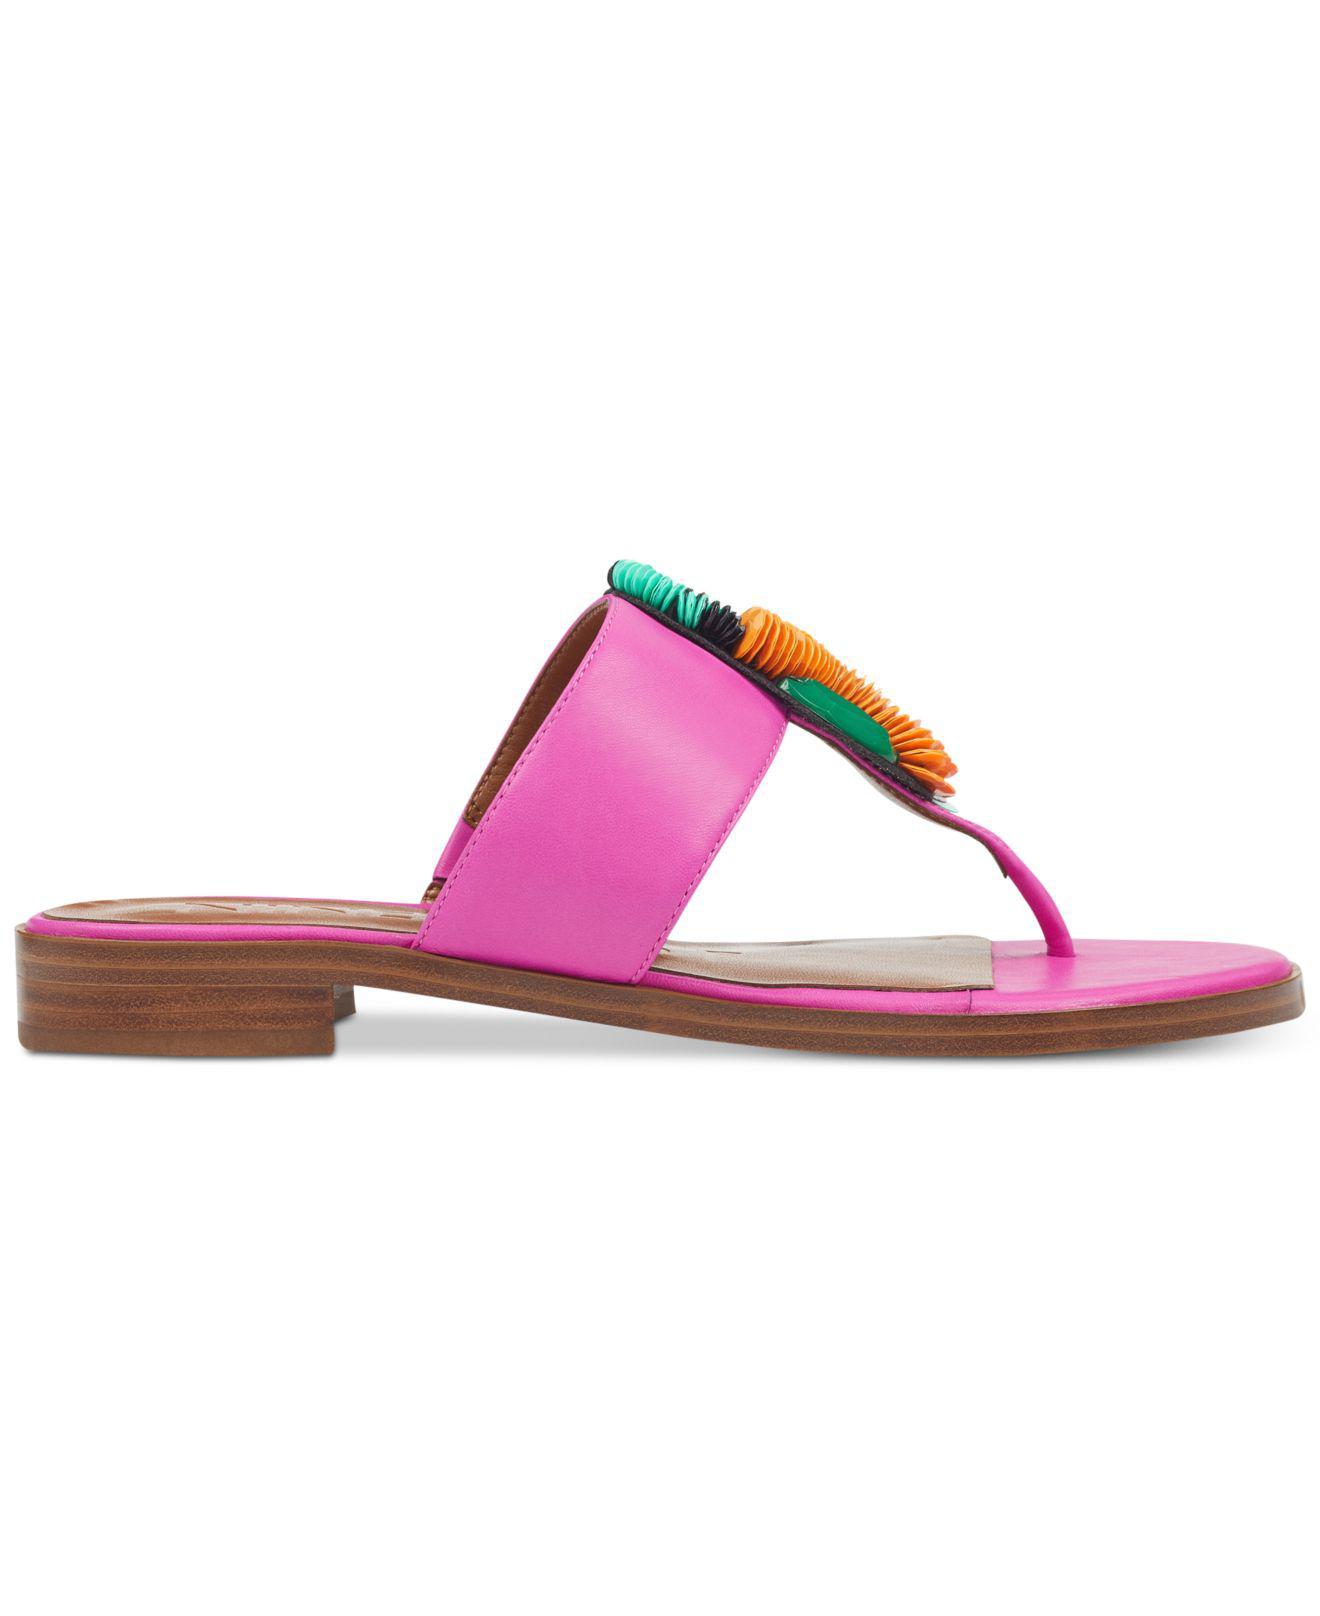 Nine West Roseriver Flat Novelty Sandals Women's Shoes hc4pSWebi